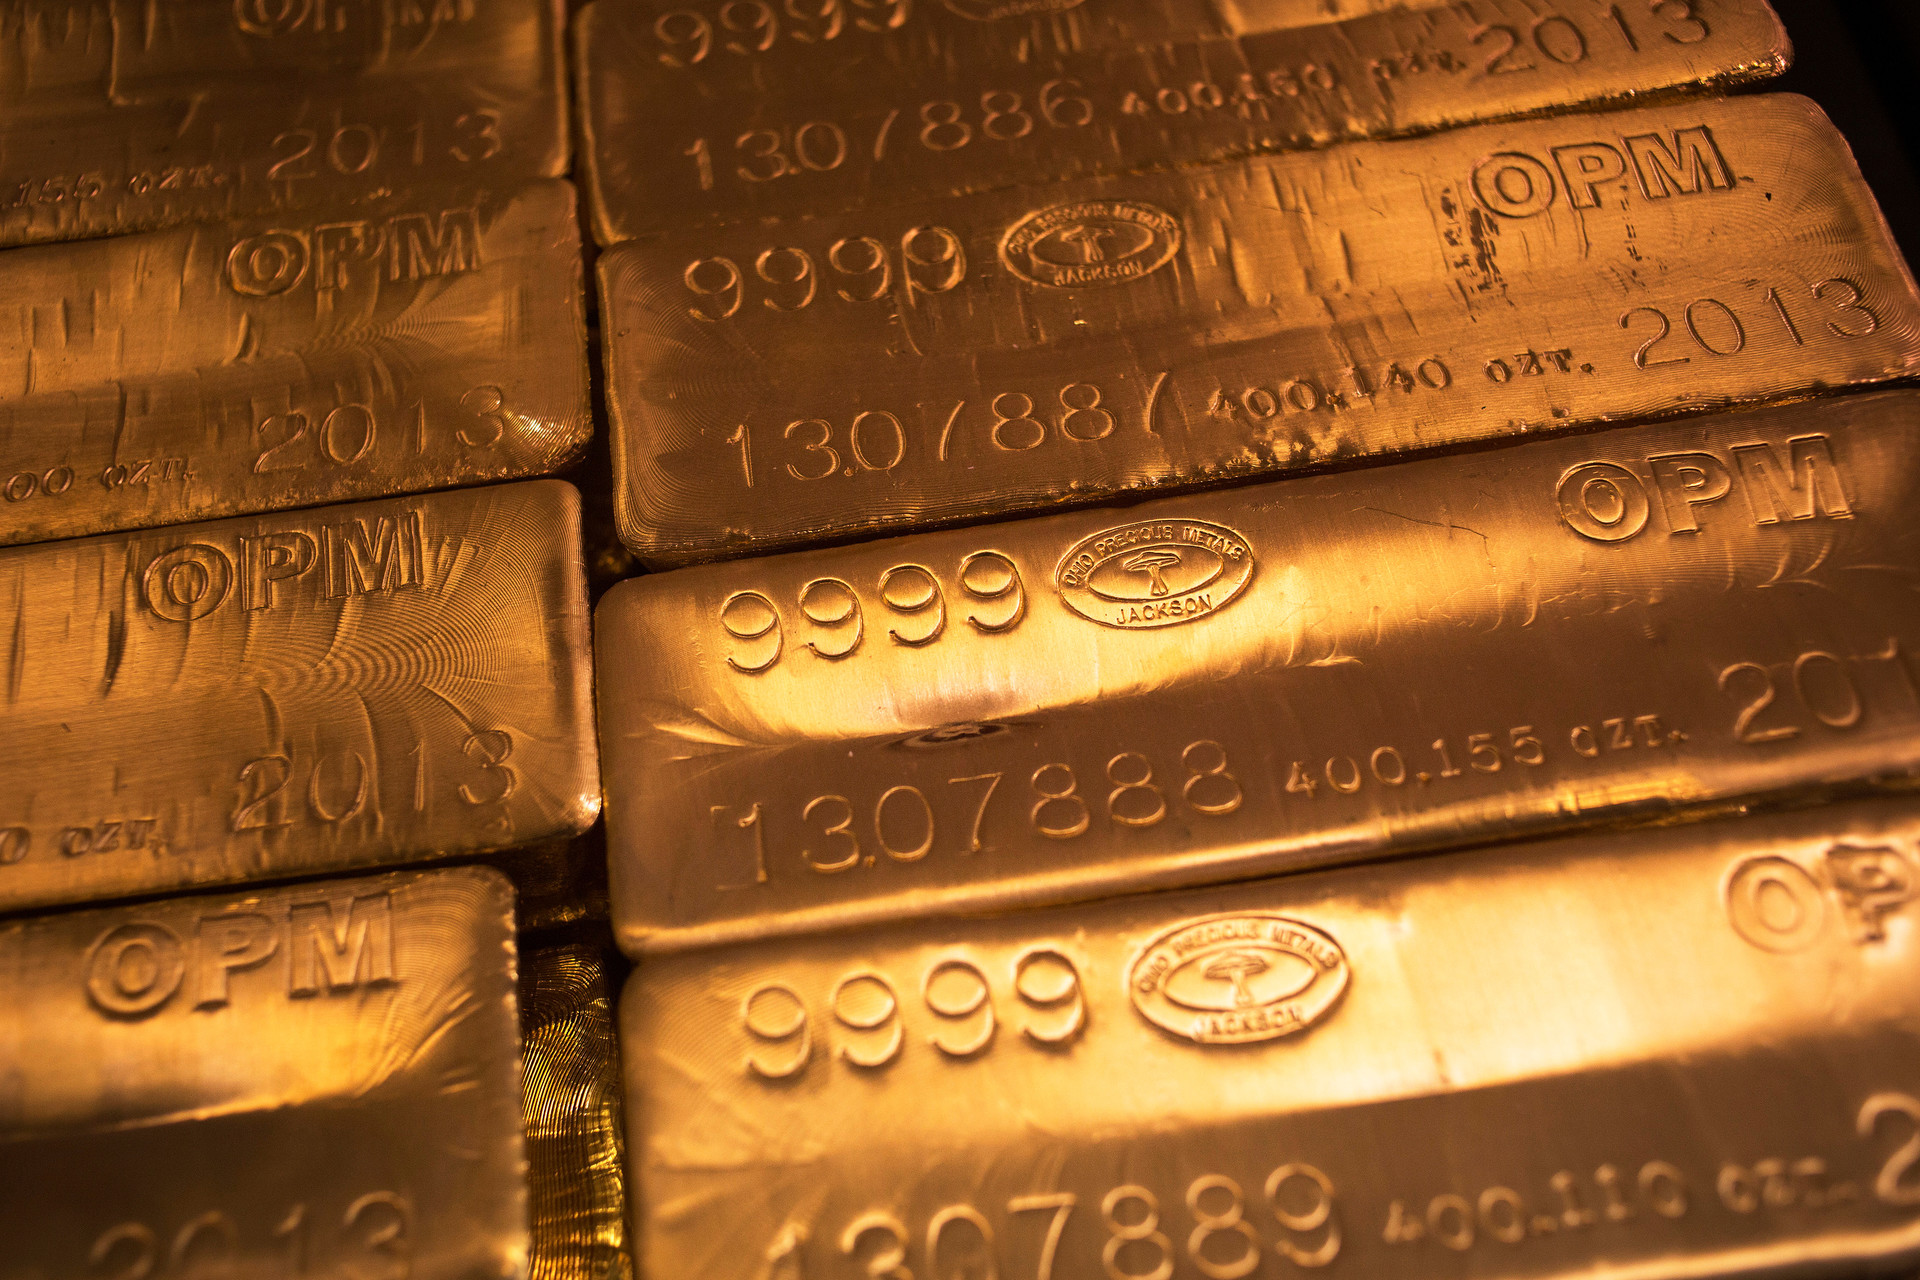 Barras de oro de 24 quilates